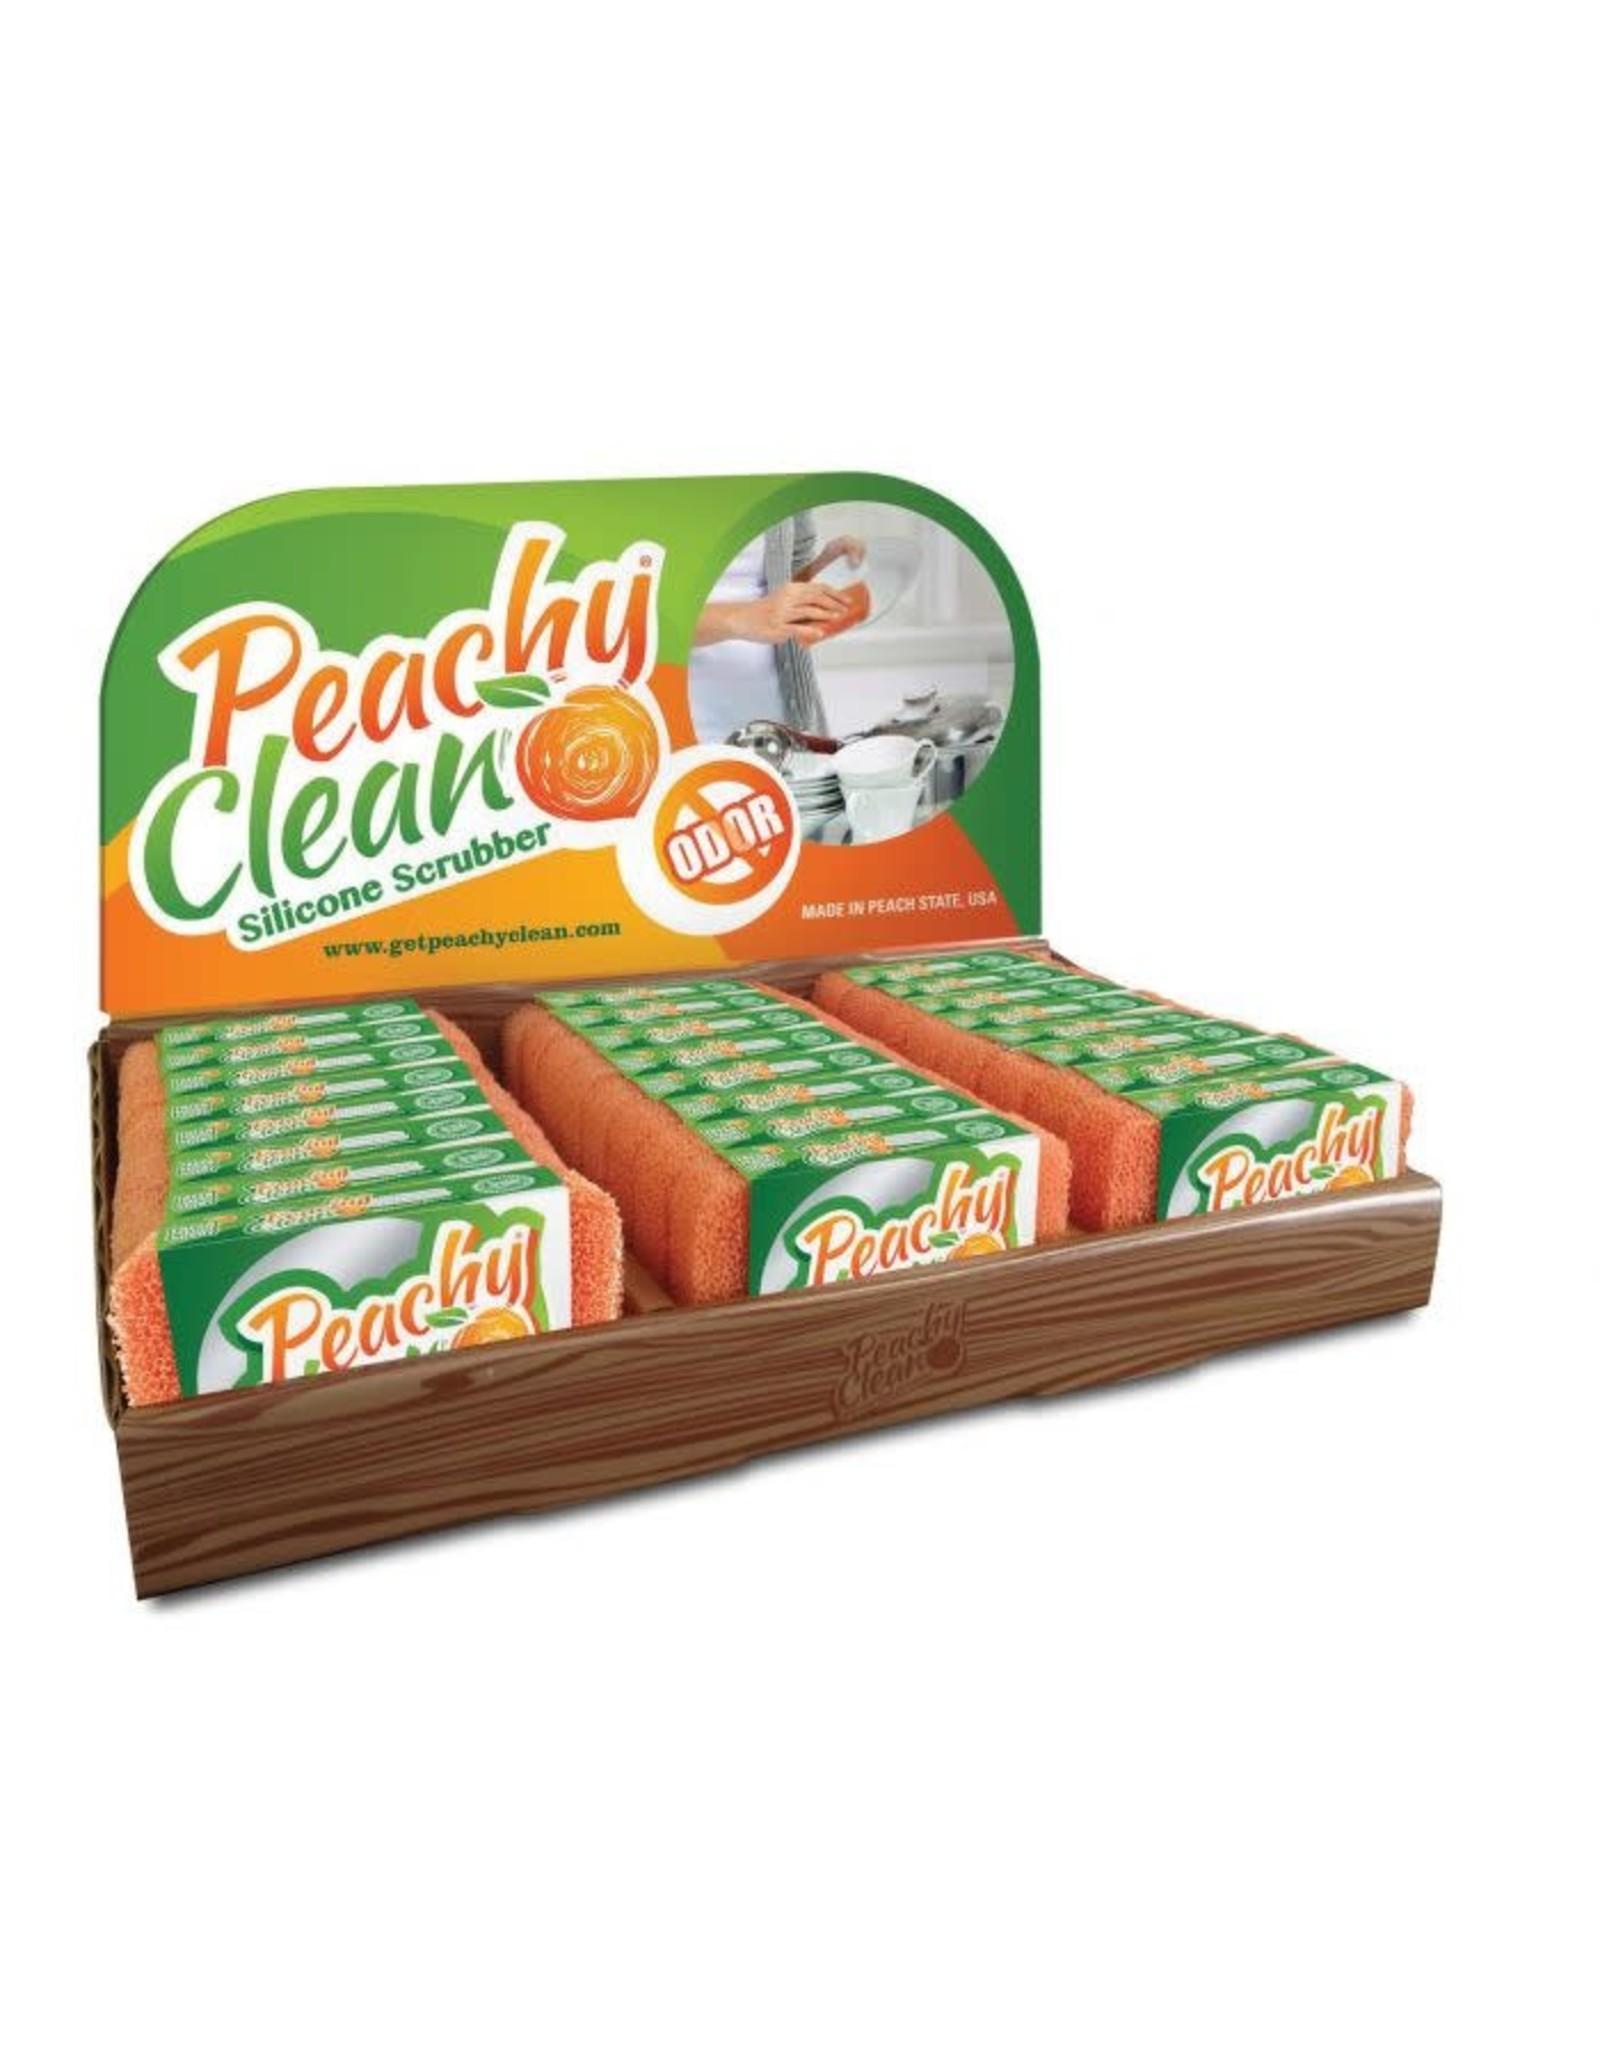 Silicone Scrubber, Peachy Clean